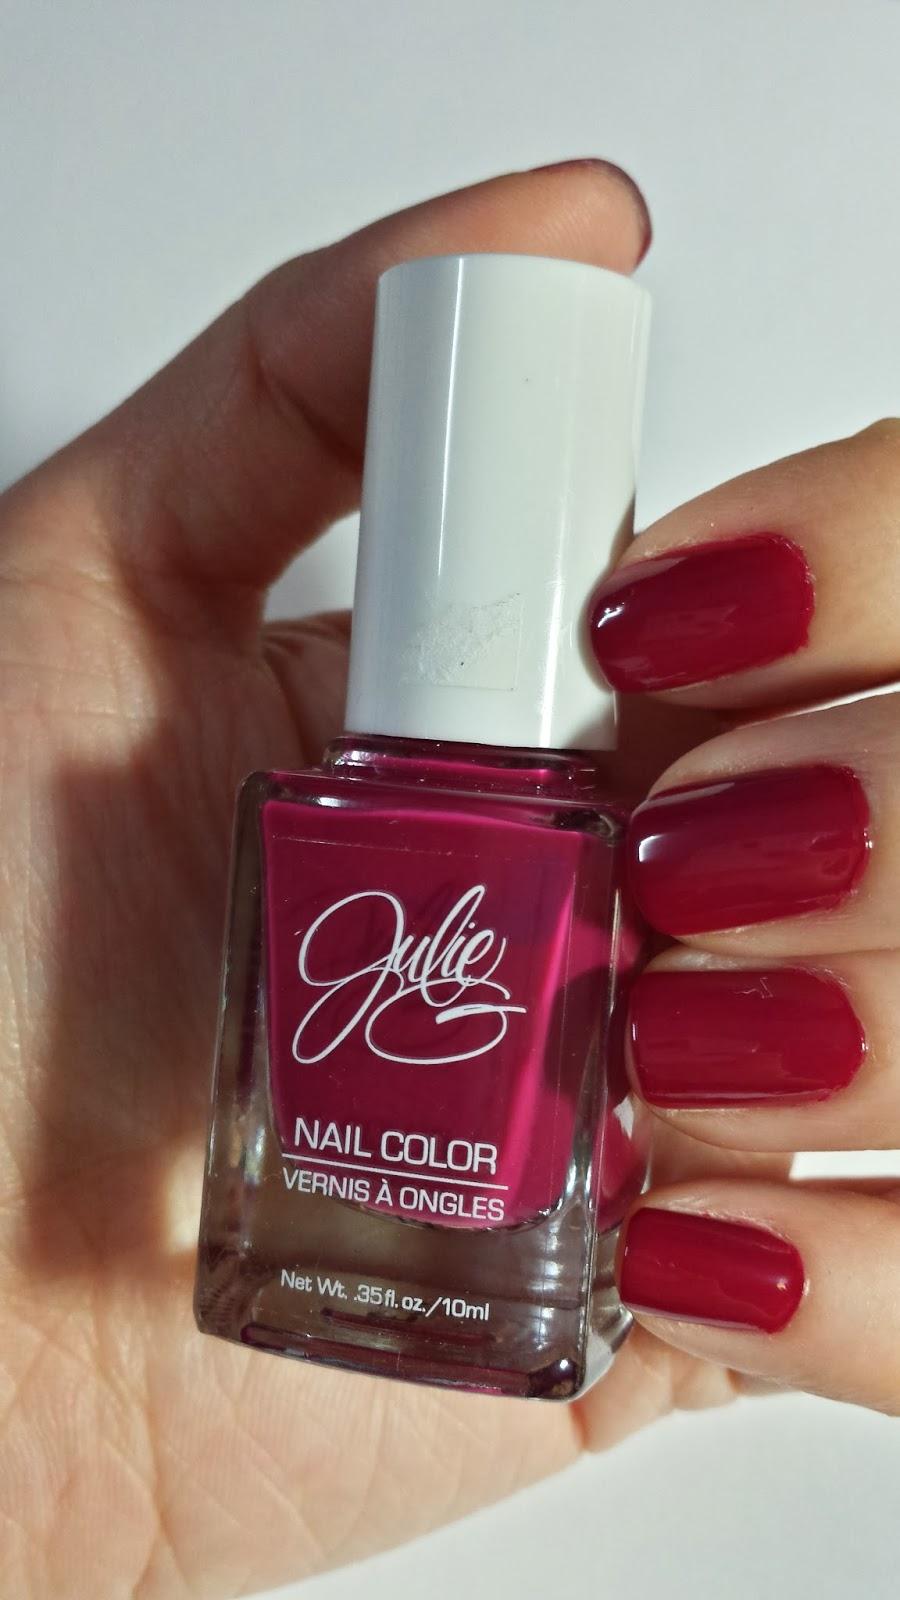 beautopiaxoxo - Beauty and Fashion!: Julie G\'s Peep Toe Pumps and L ...